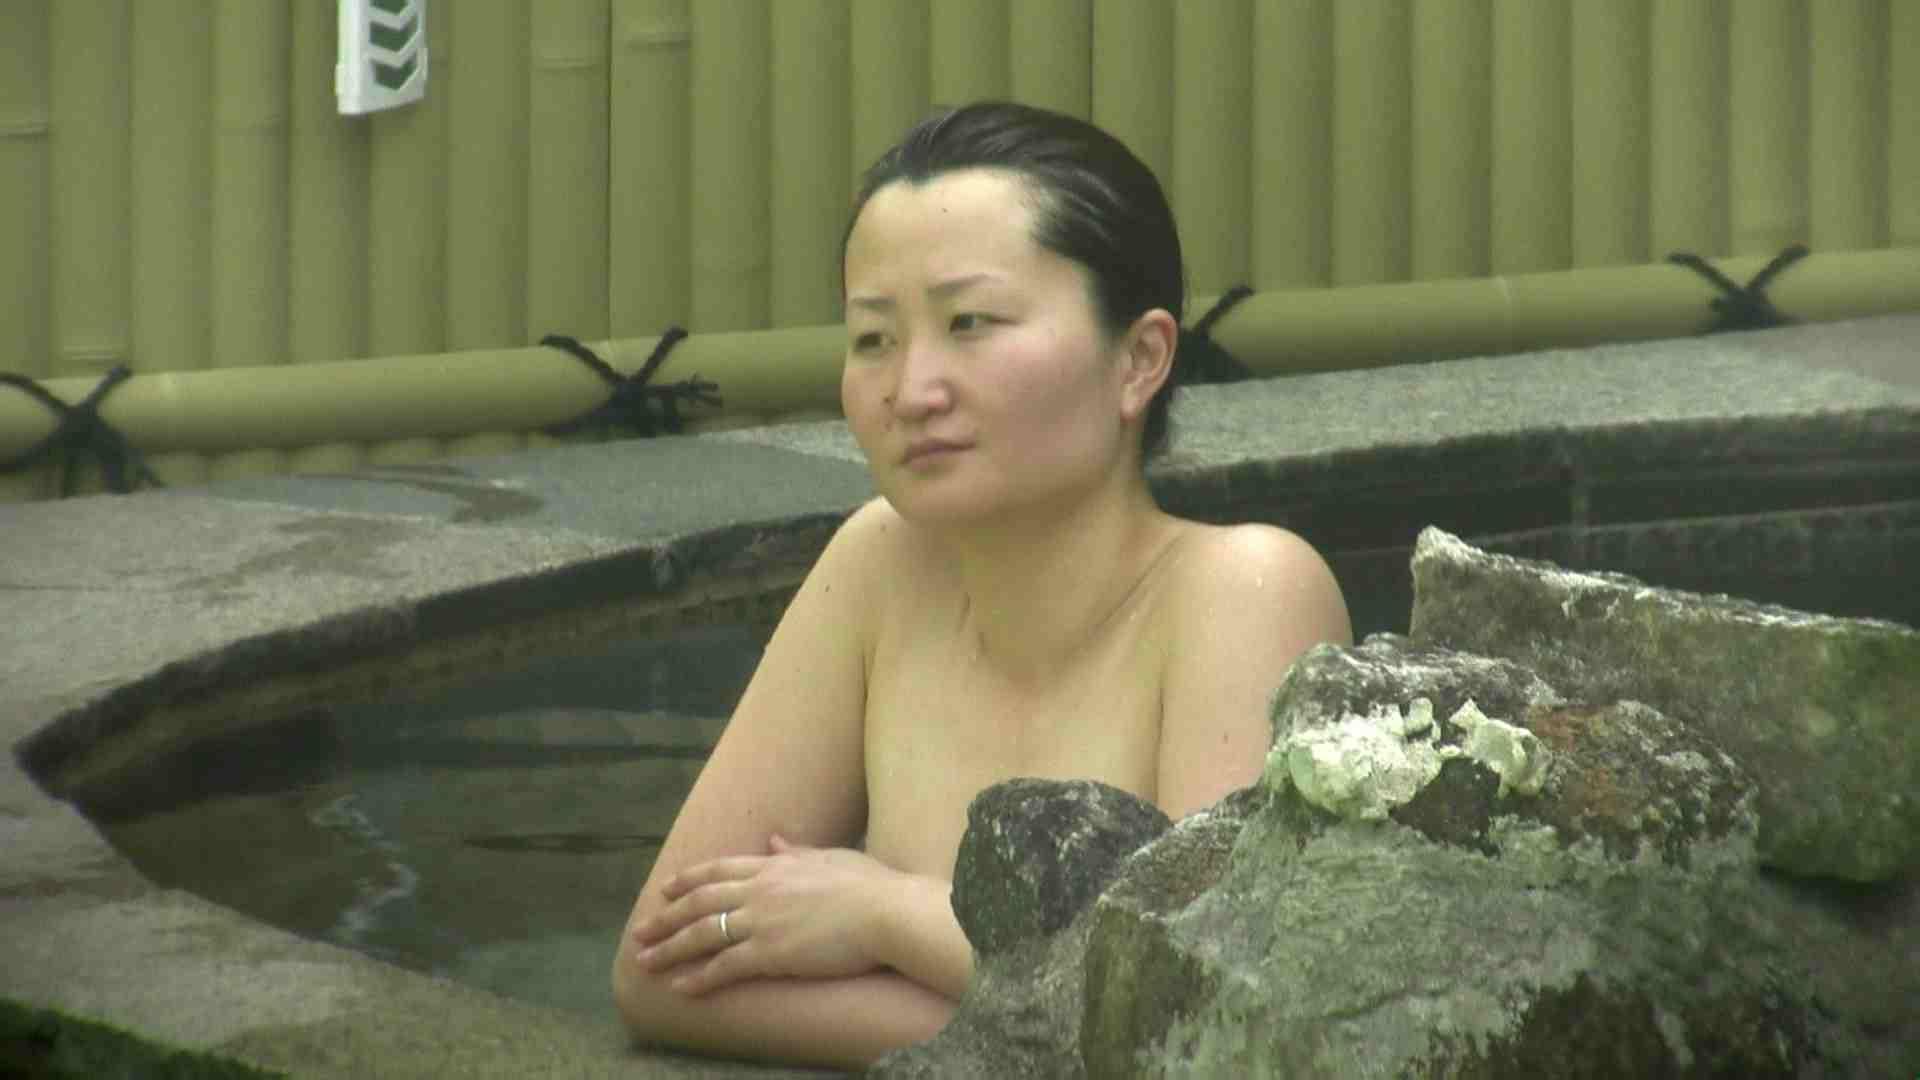 Aquaな露天風呂Vol.632 盗撮シリーズ | 露天風呂編  100PIX 17